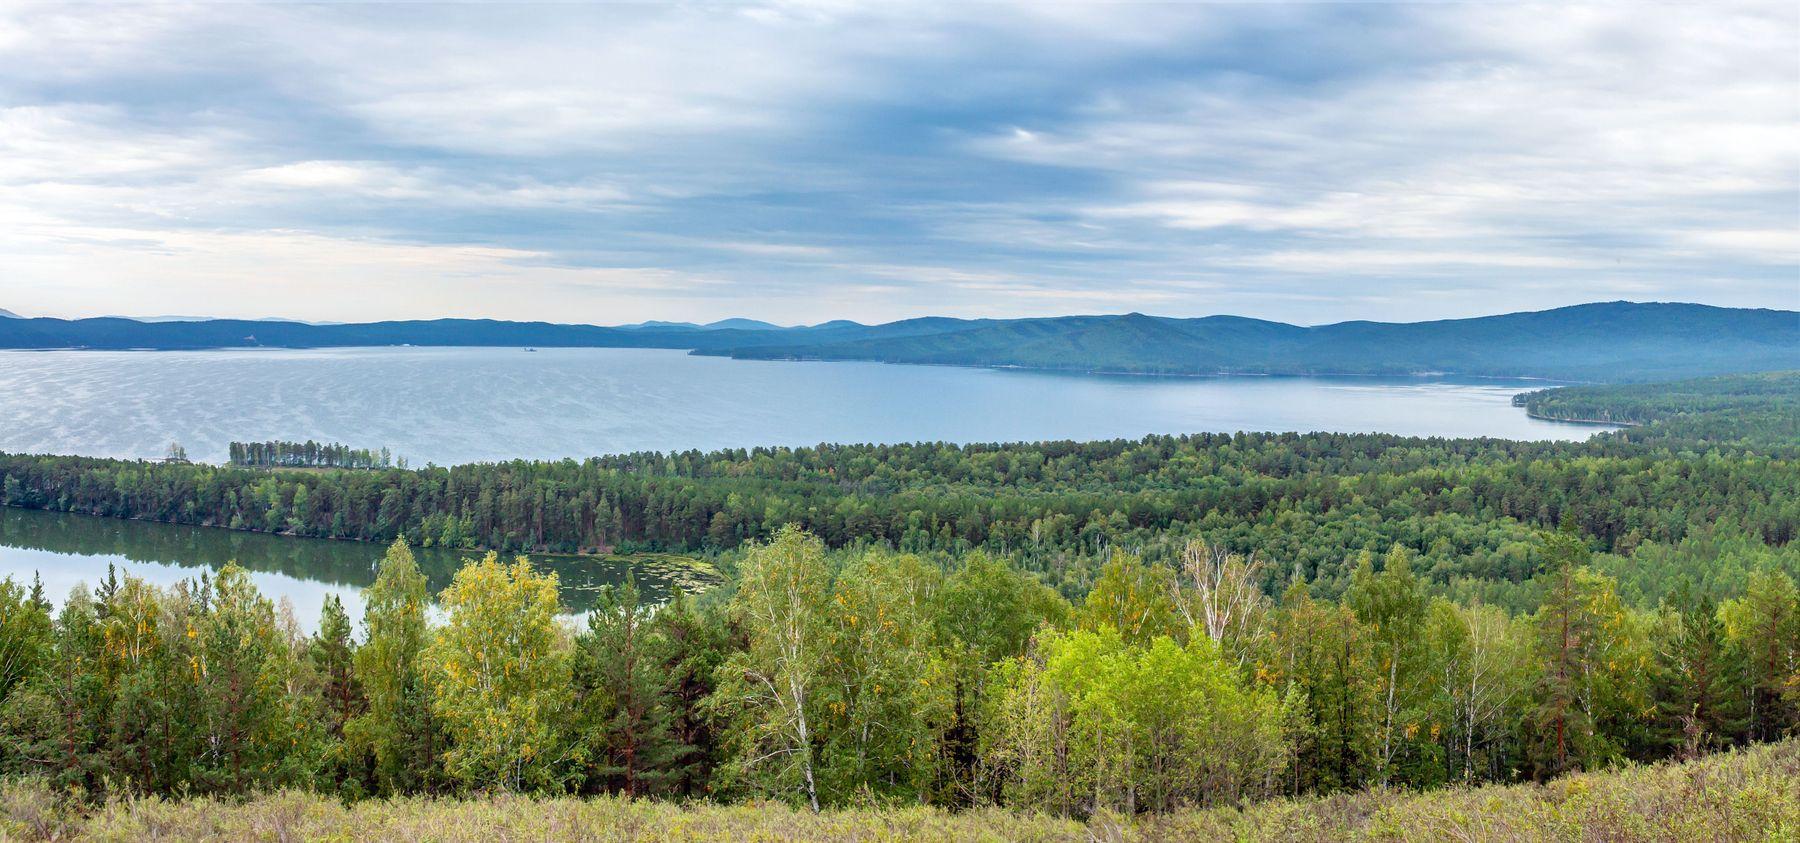 Озеро Тургояк. (панорама) Южный Урал Миасс Тургояк природа озеро лето